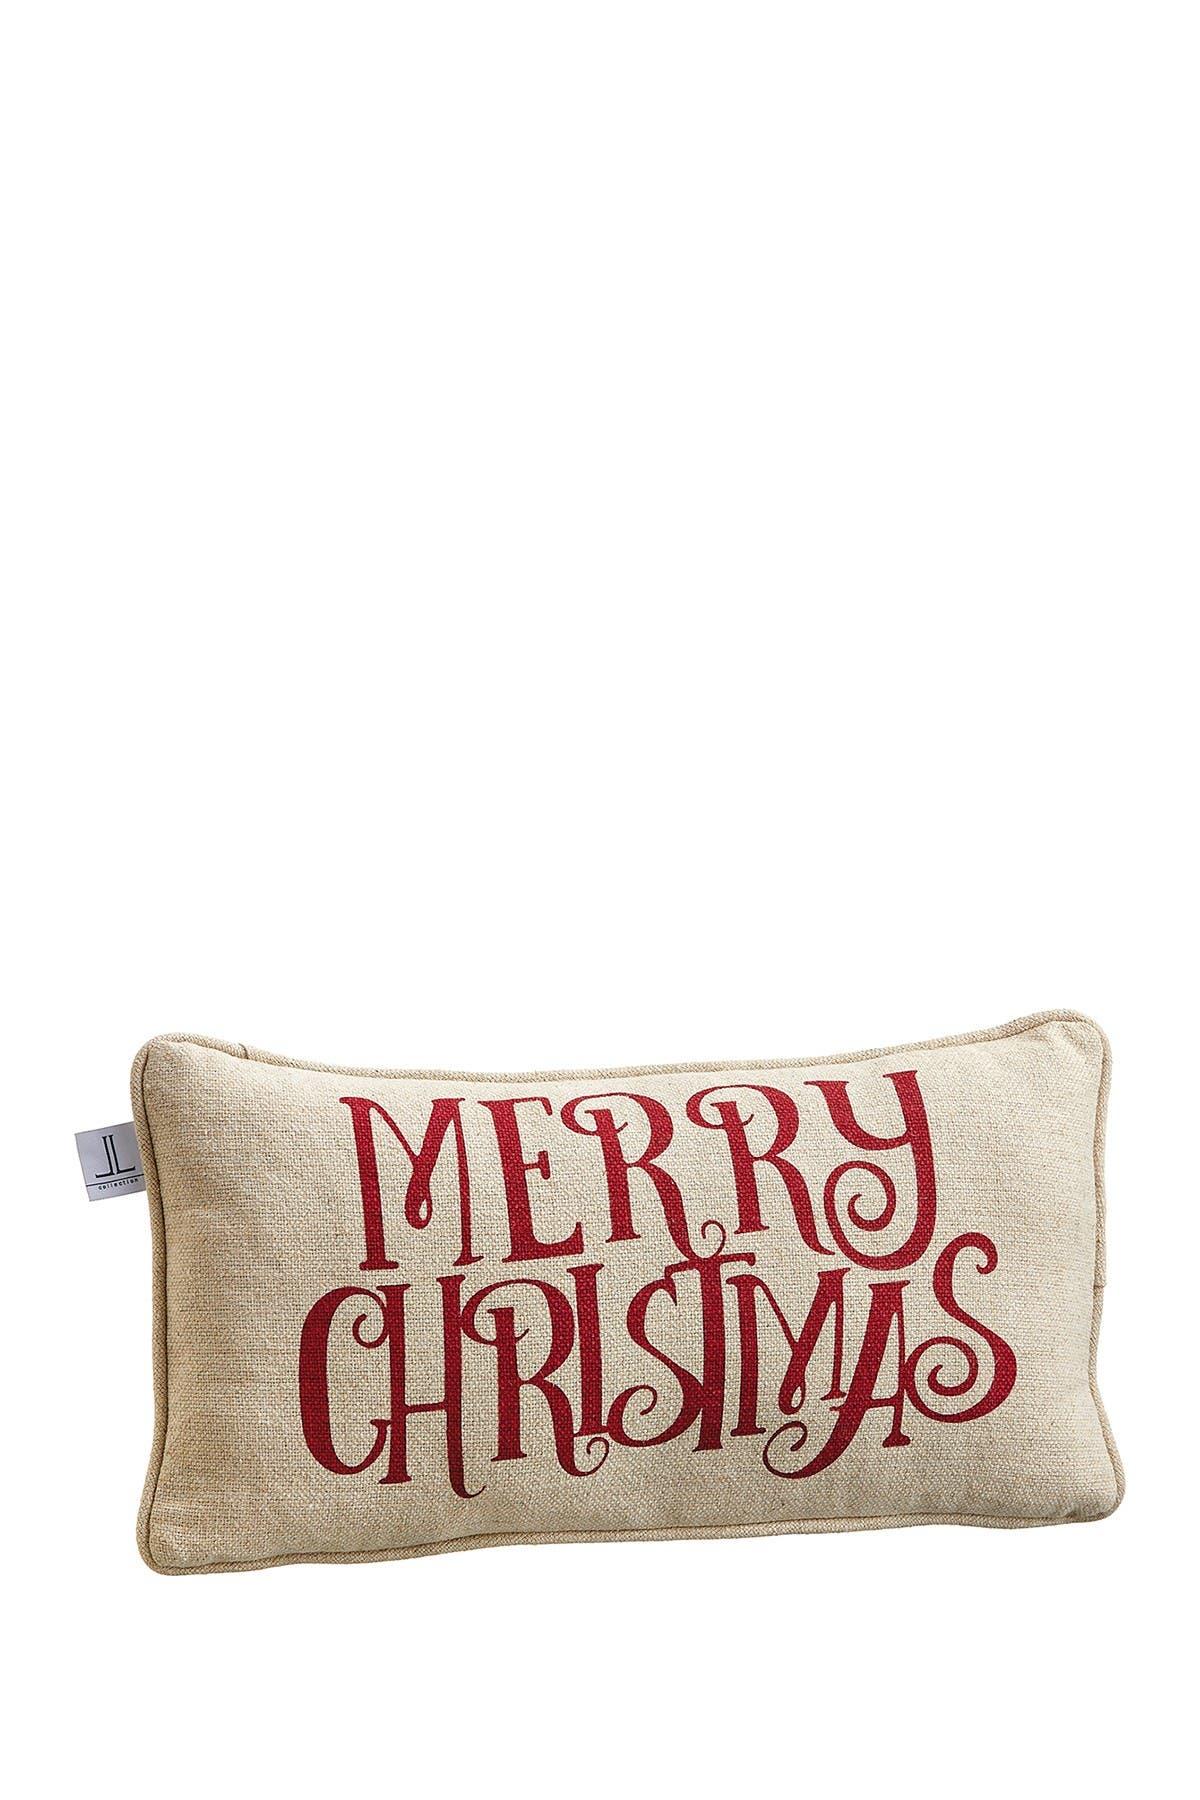 allstate 22 x 12 merry christmas pillow nordstrom rack allstate 22 x 12 merry christmas pillow nordstrom rack